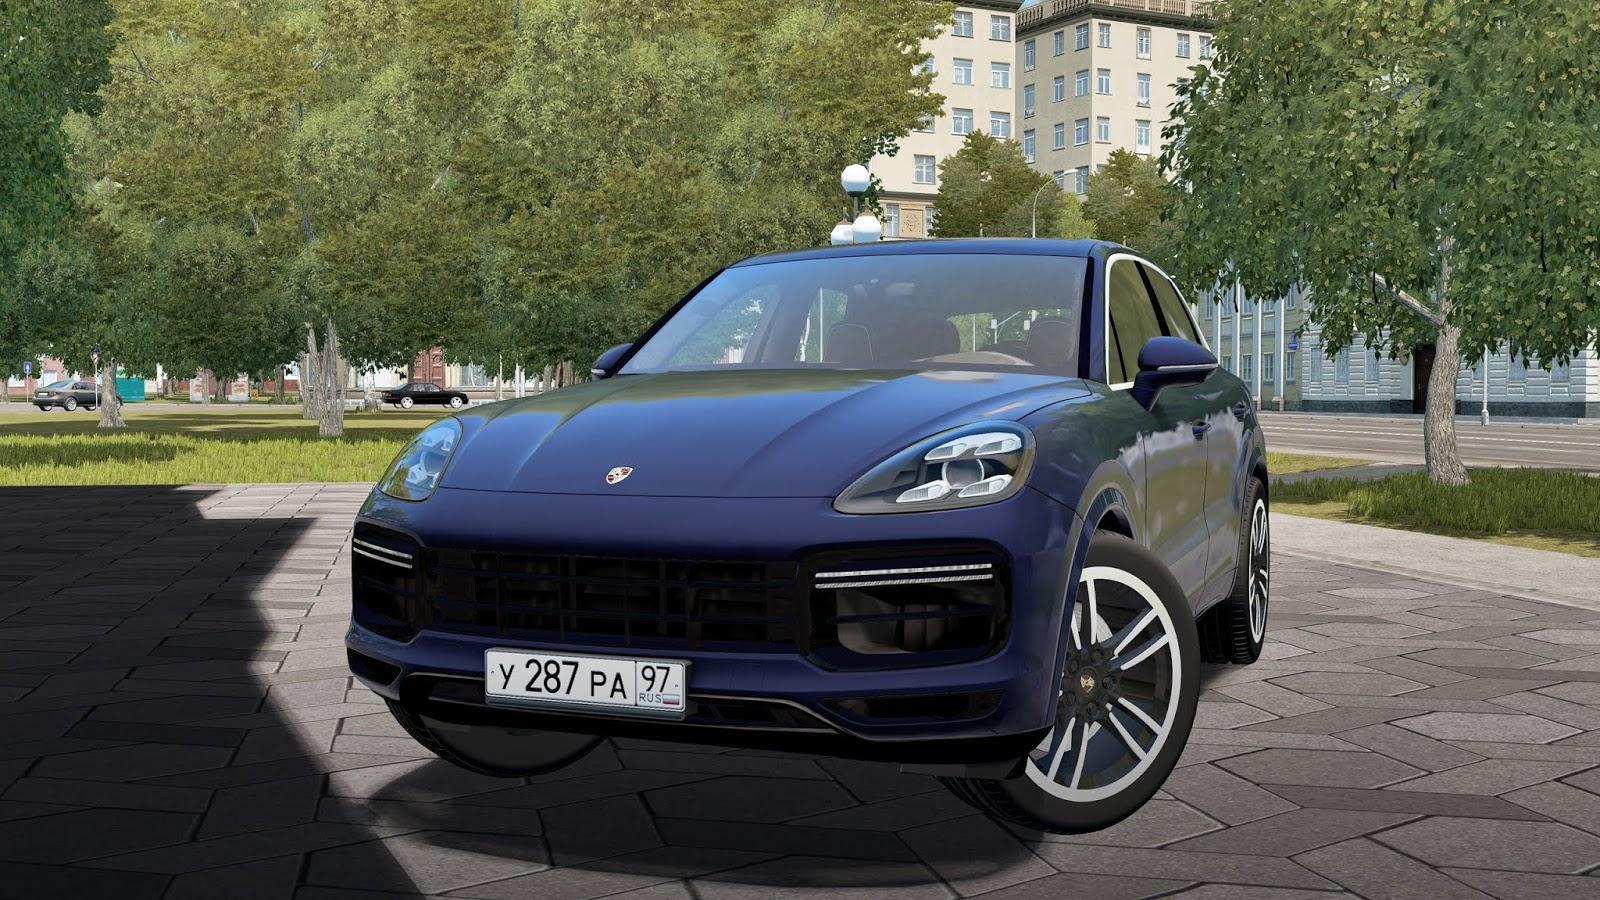 b3704b39bdb About City Car Driving 1.5.7 Car Mod 2019 Porsche Cayenne Turbo